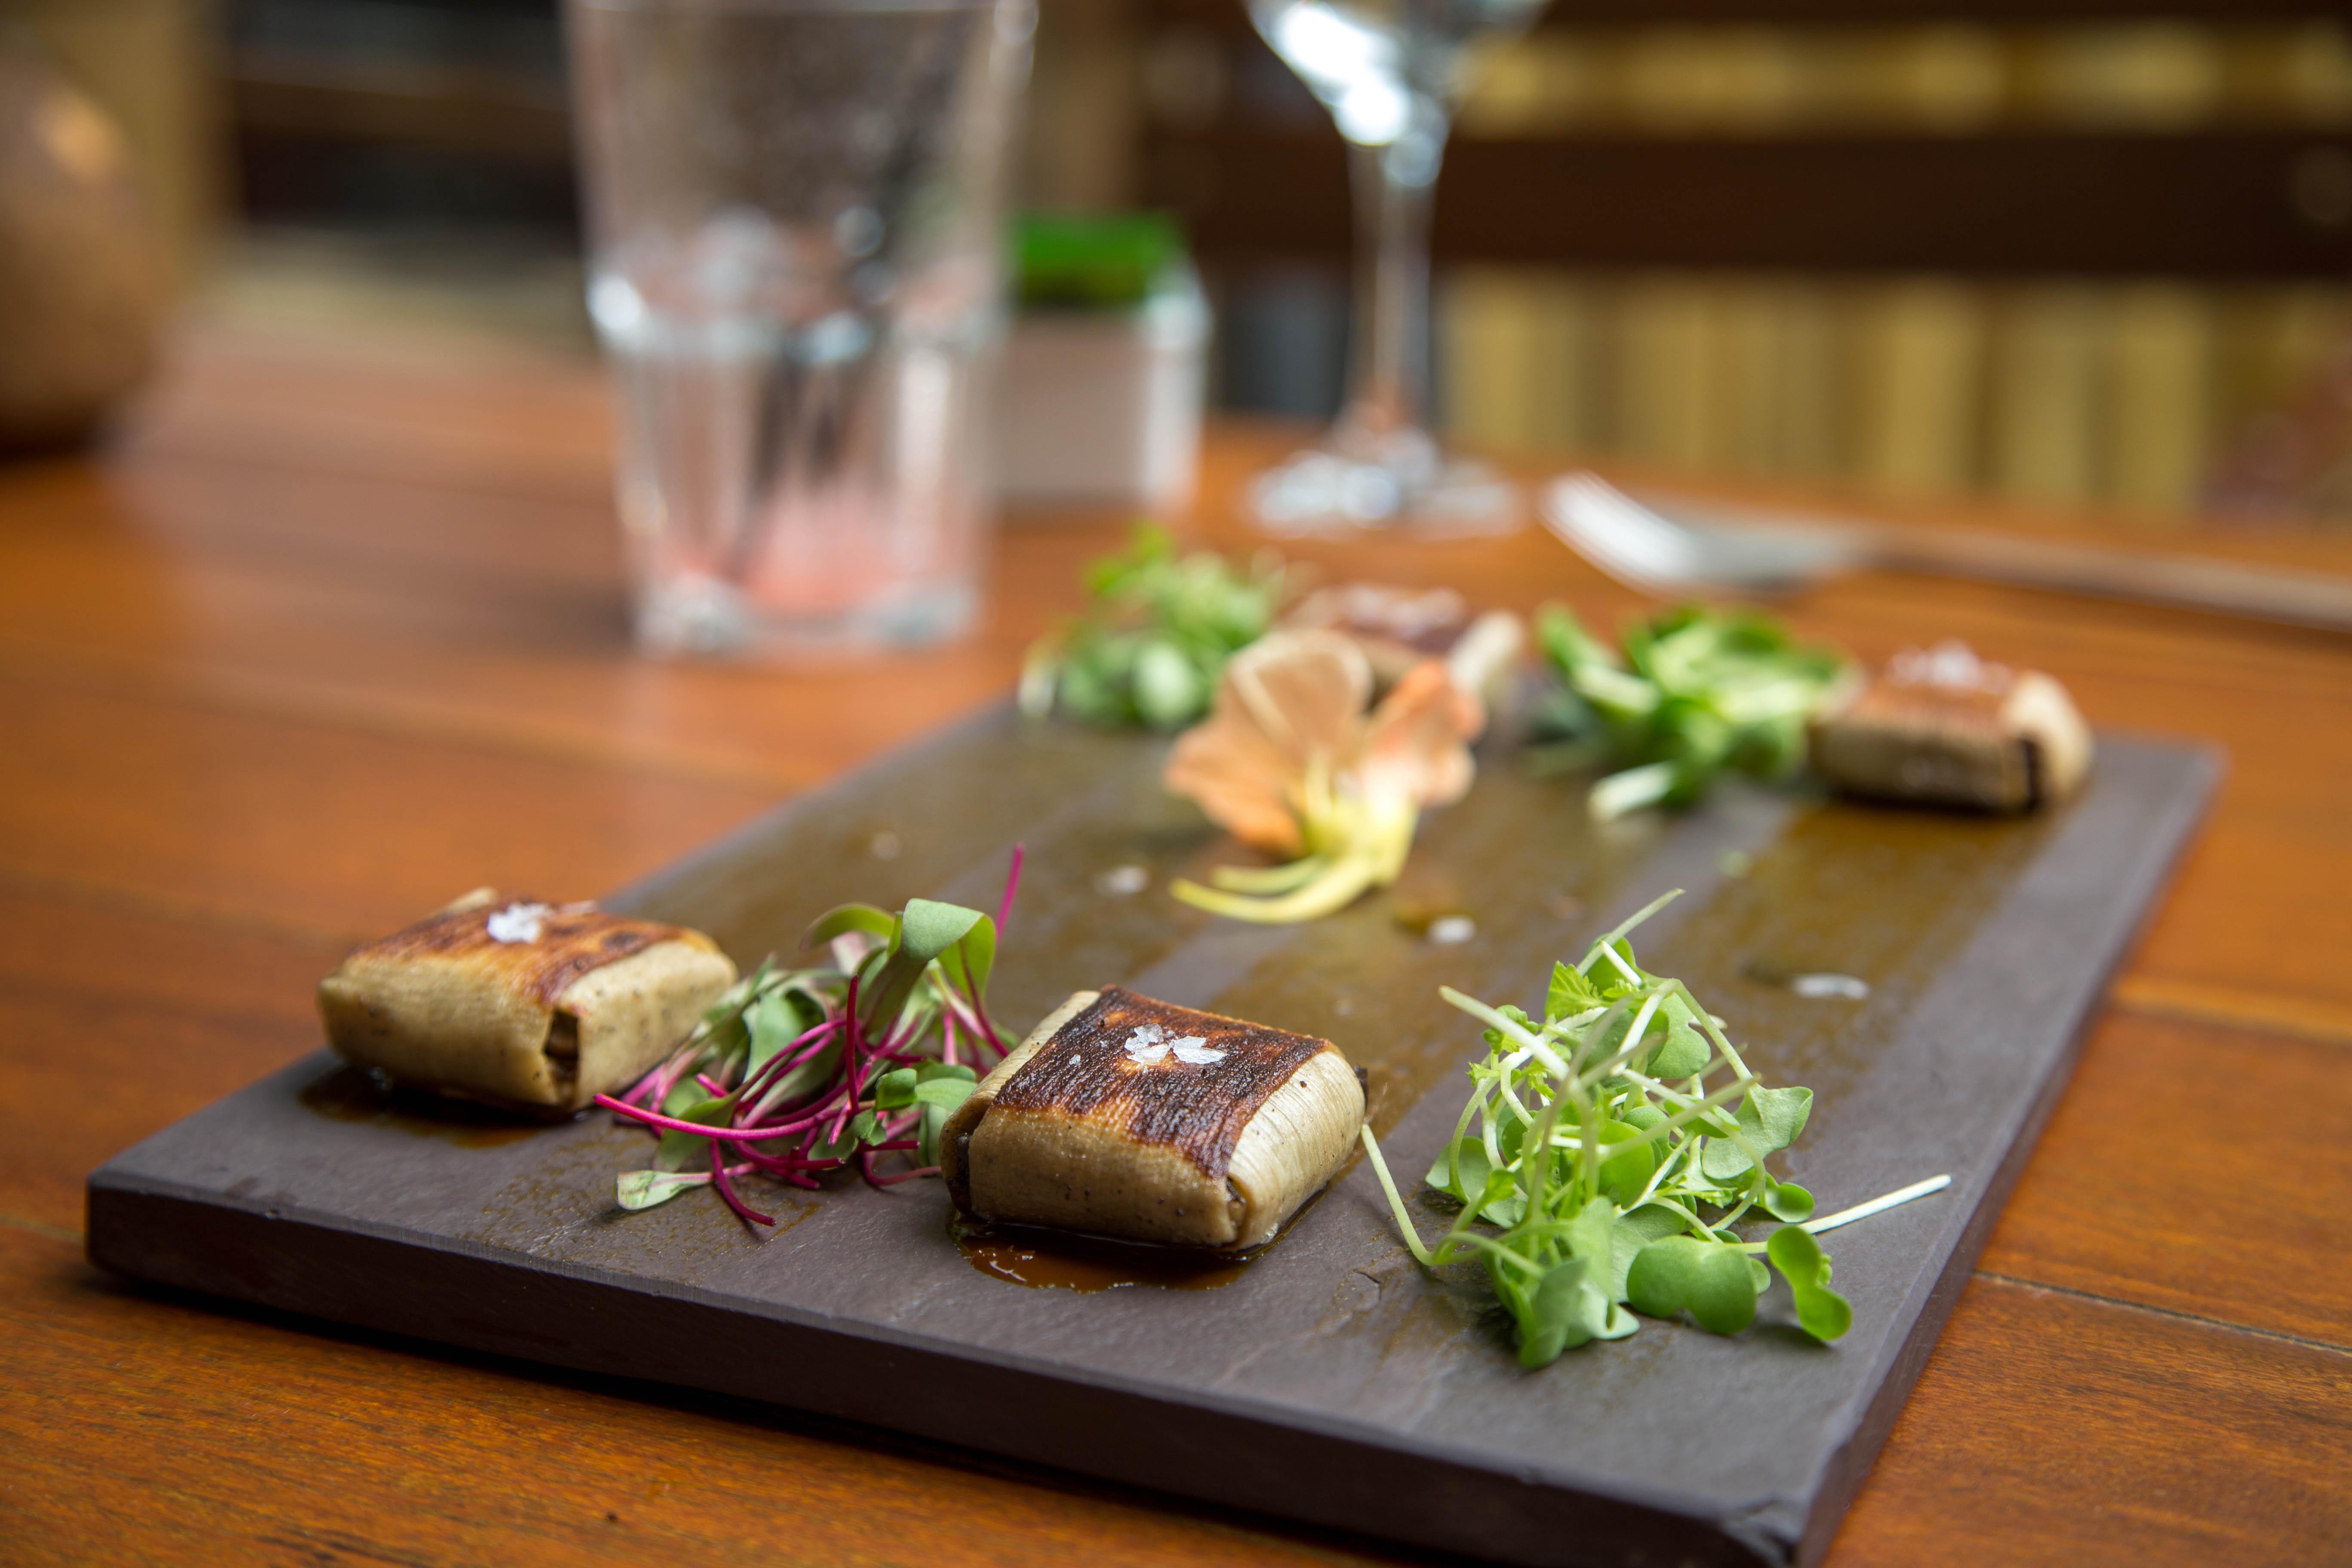 Ravioli de pupunha recheado com cogumelos